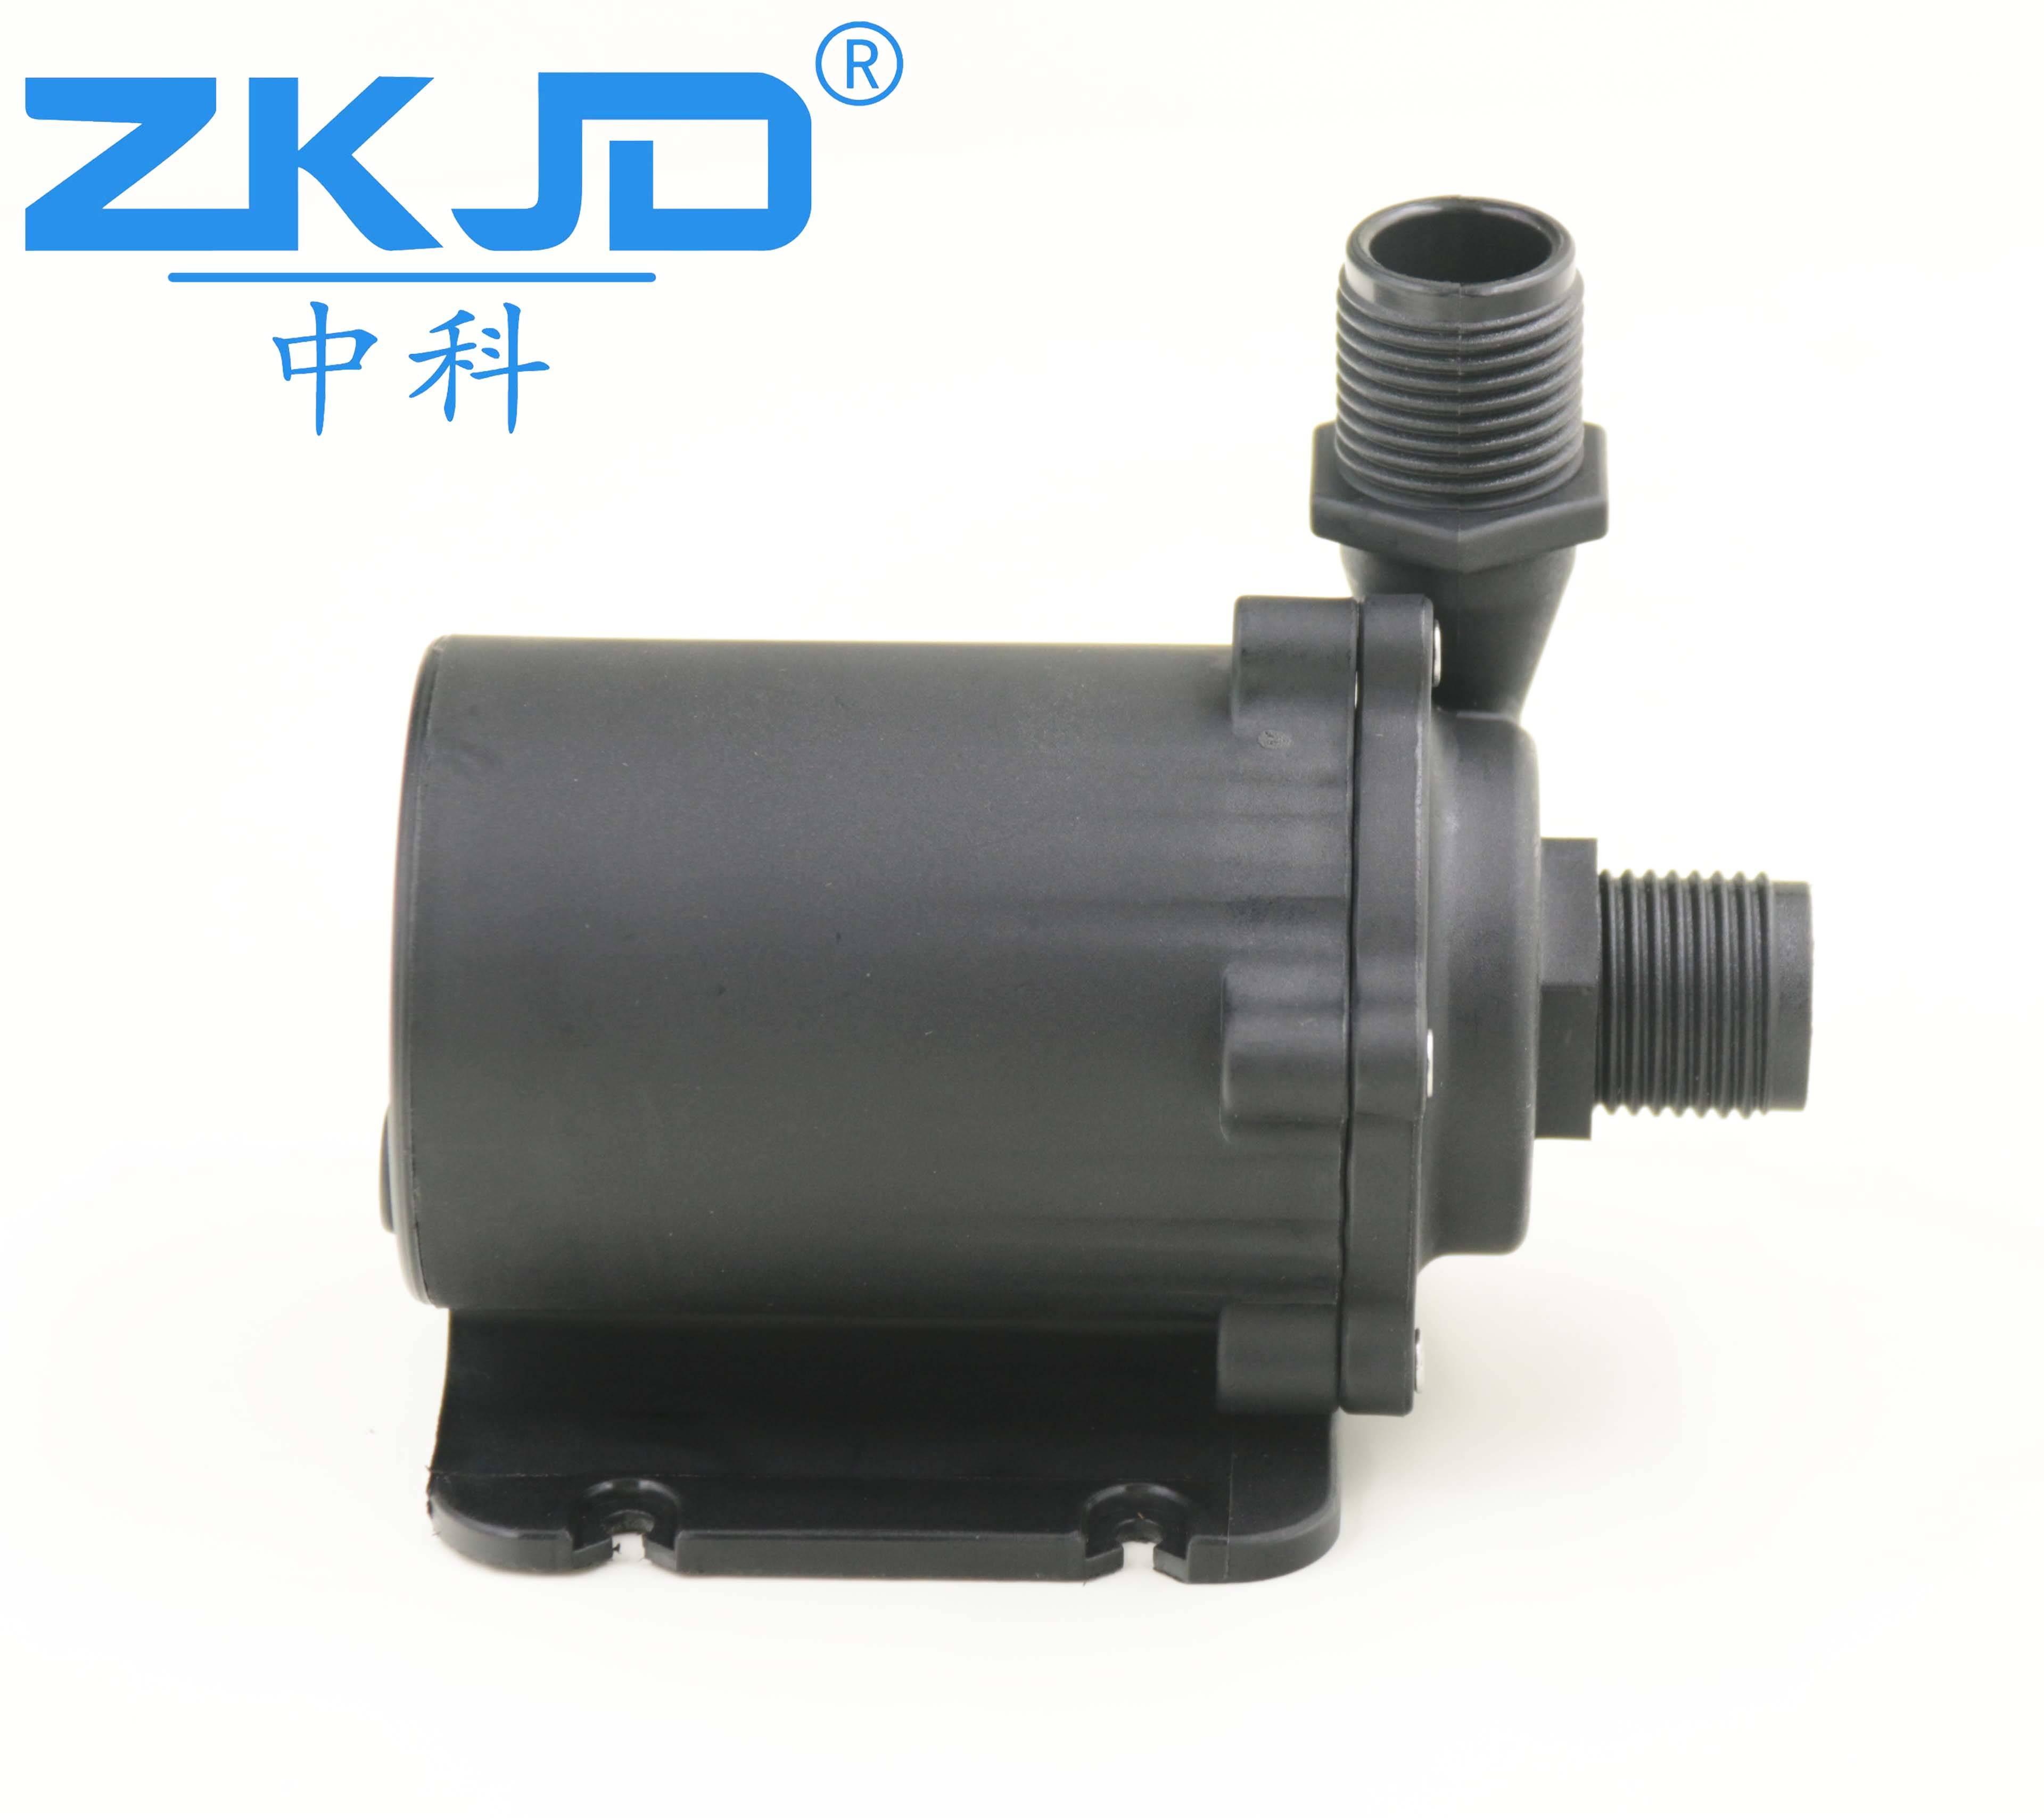 Submersible Variable speedswimming pool circulation pump